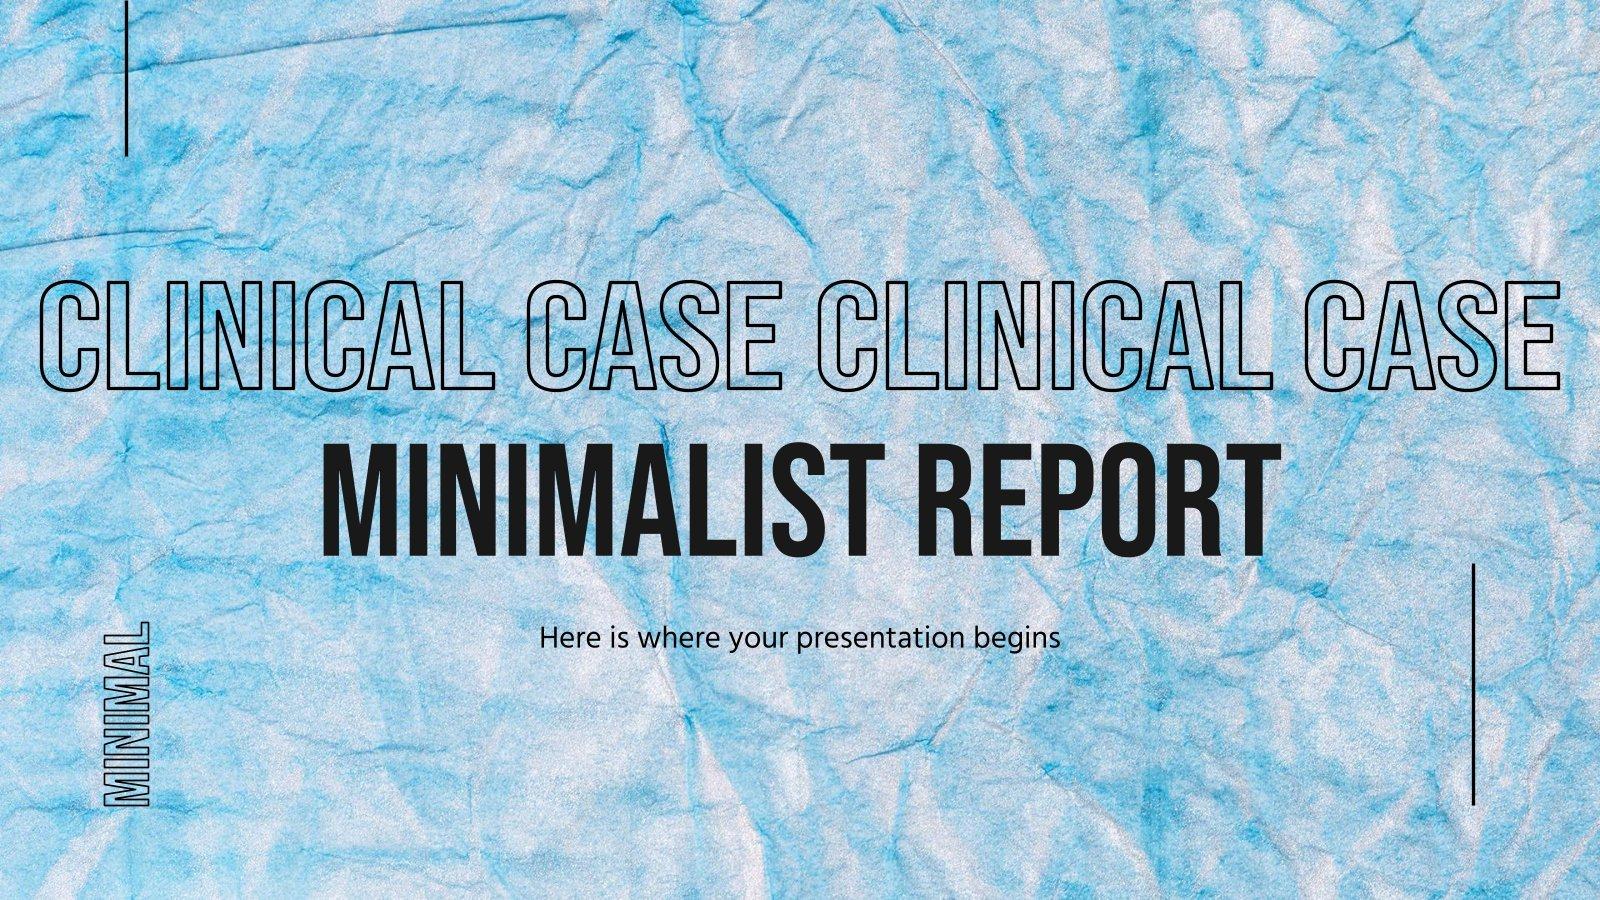 Clinical Case Minimalist Report presentation template